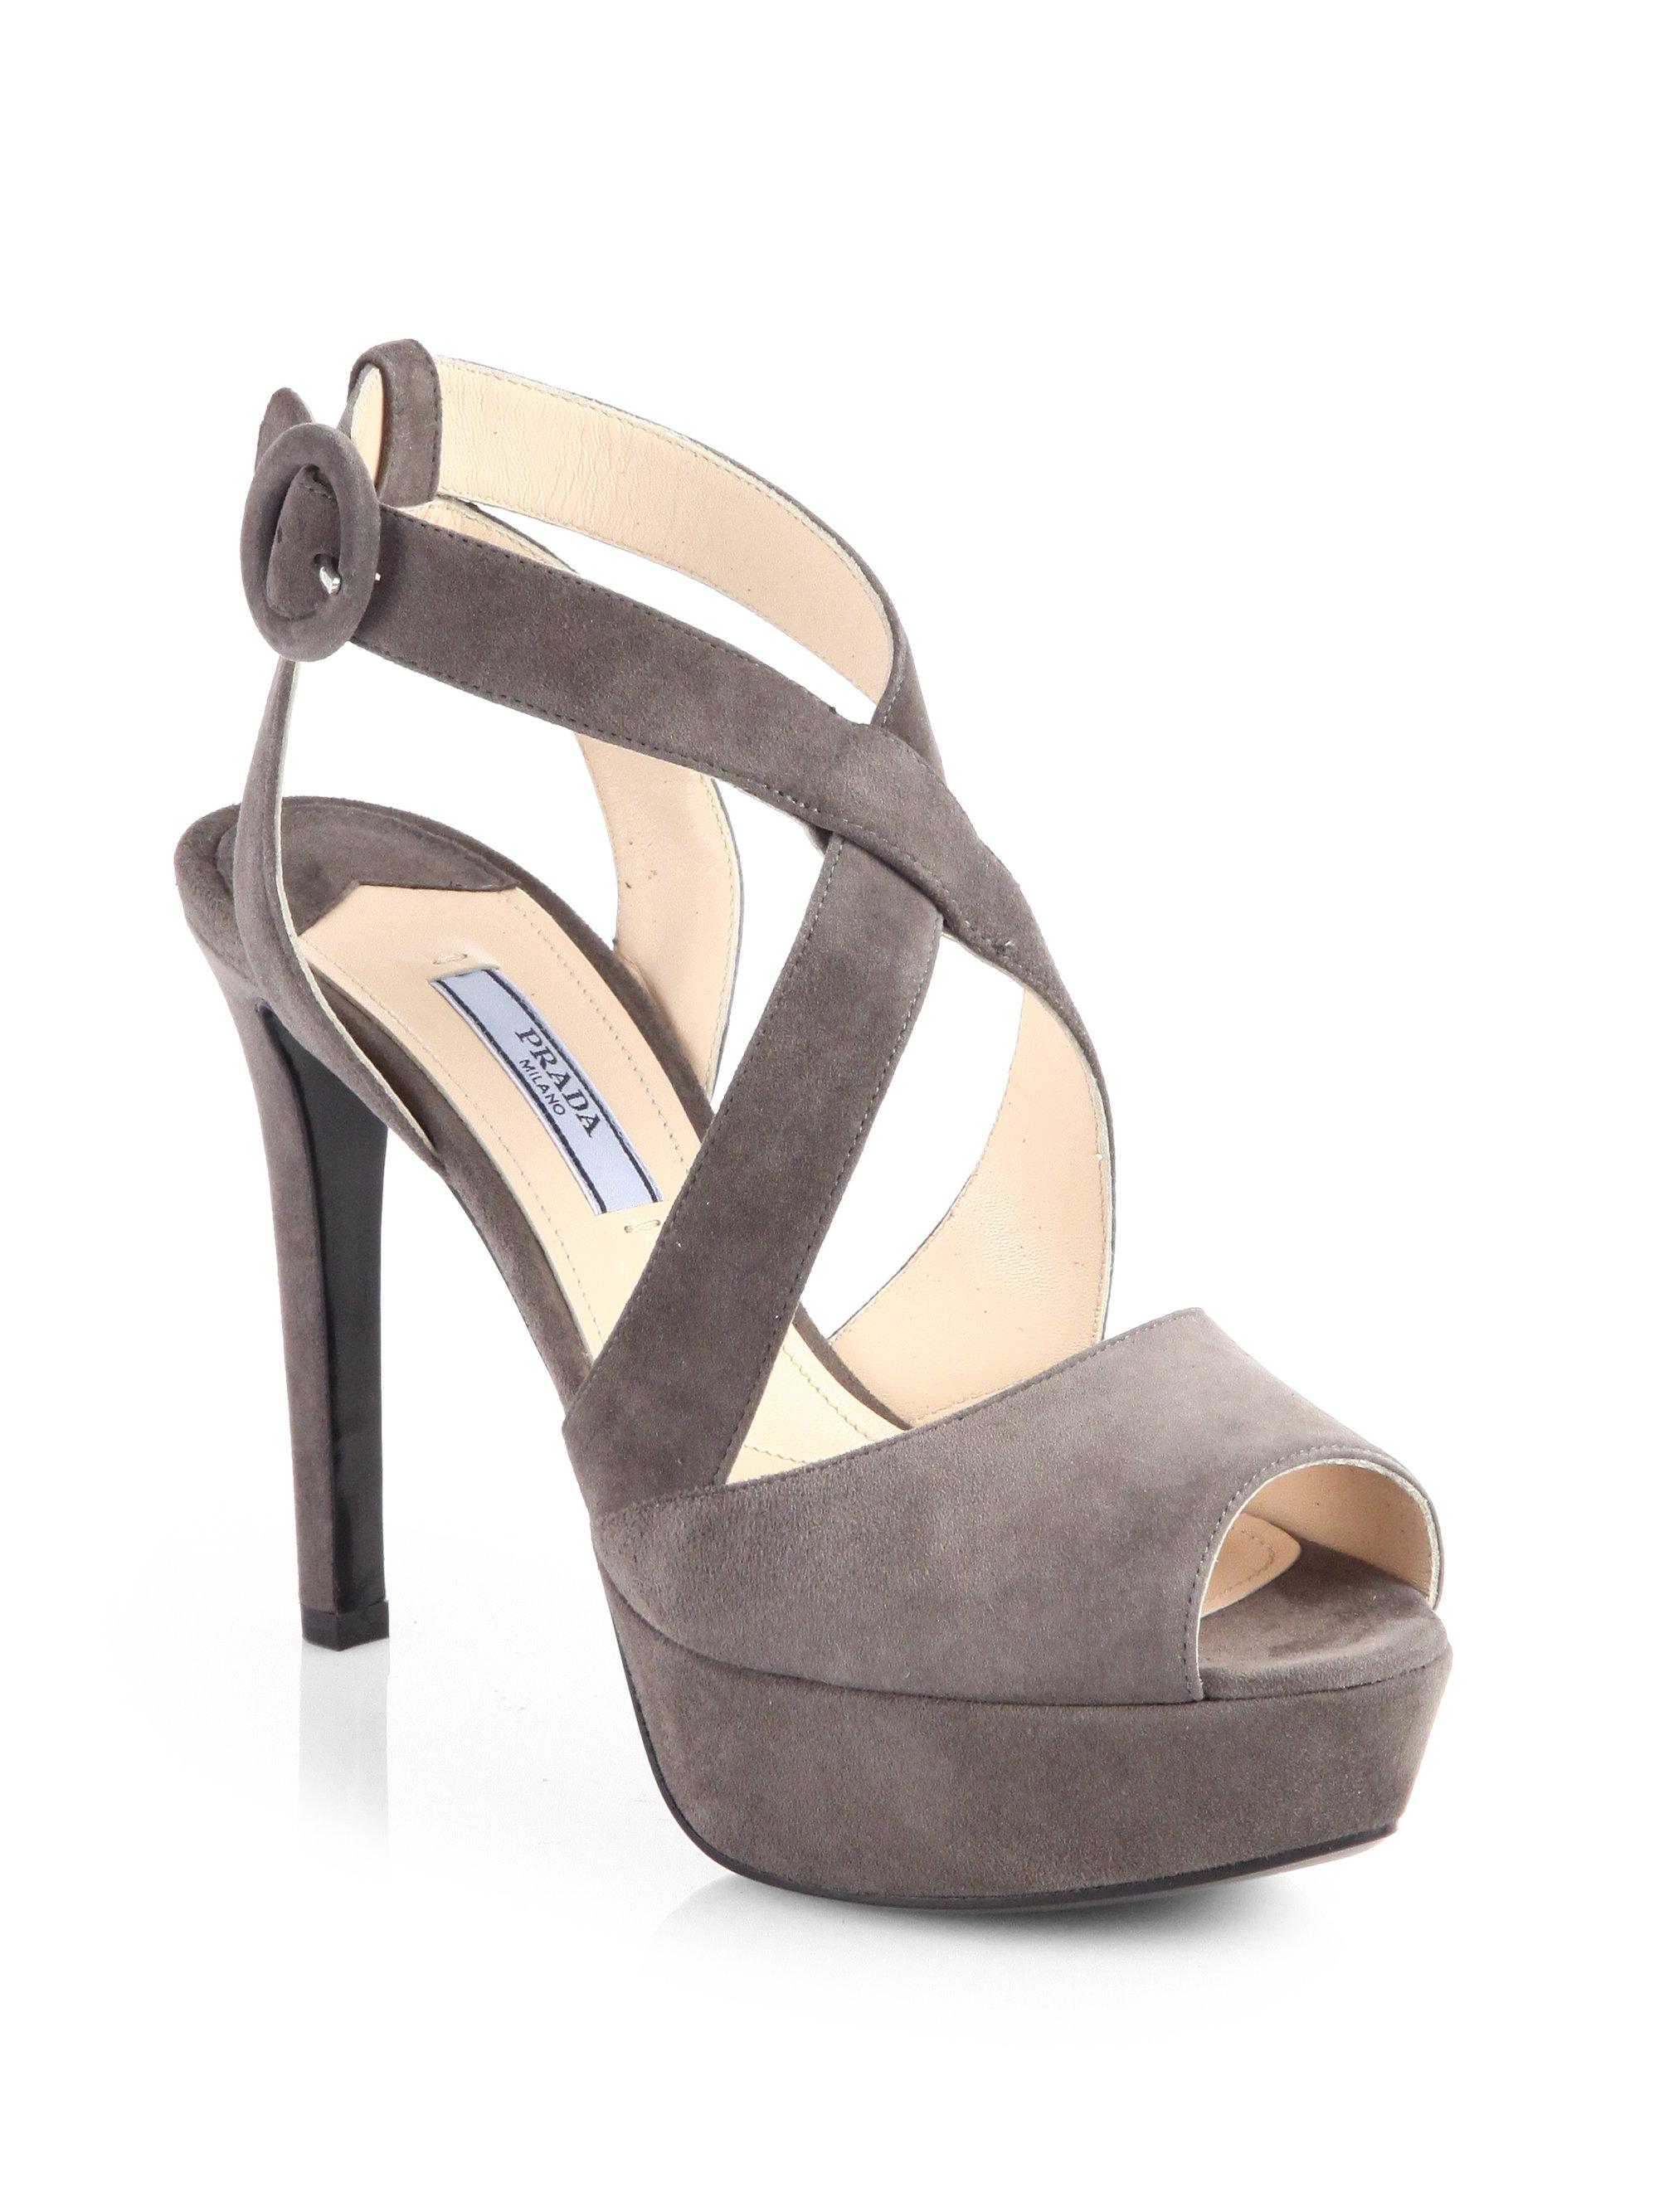 Prada Suede Crisscross Platform Sandals